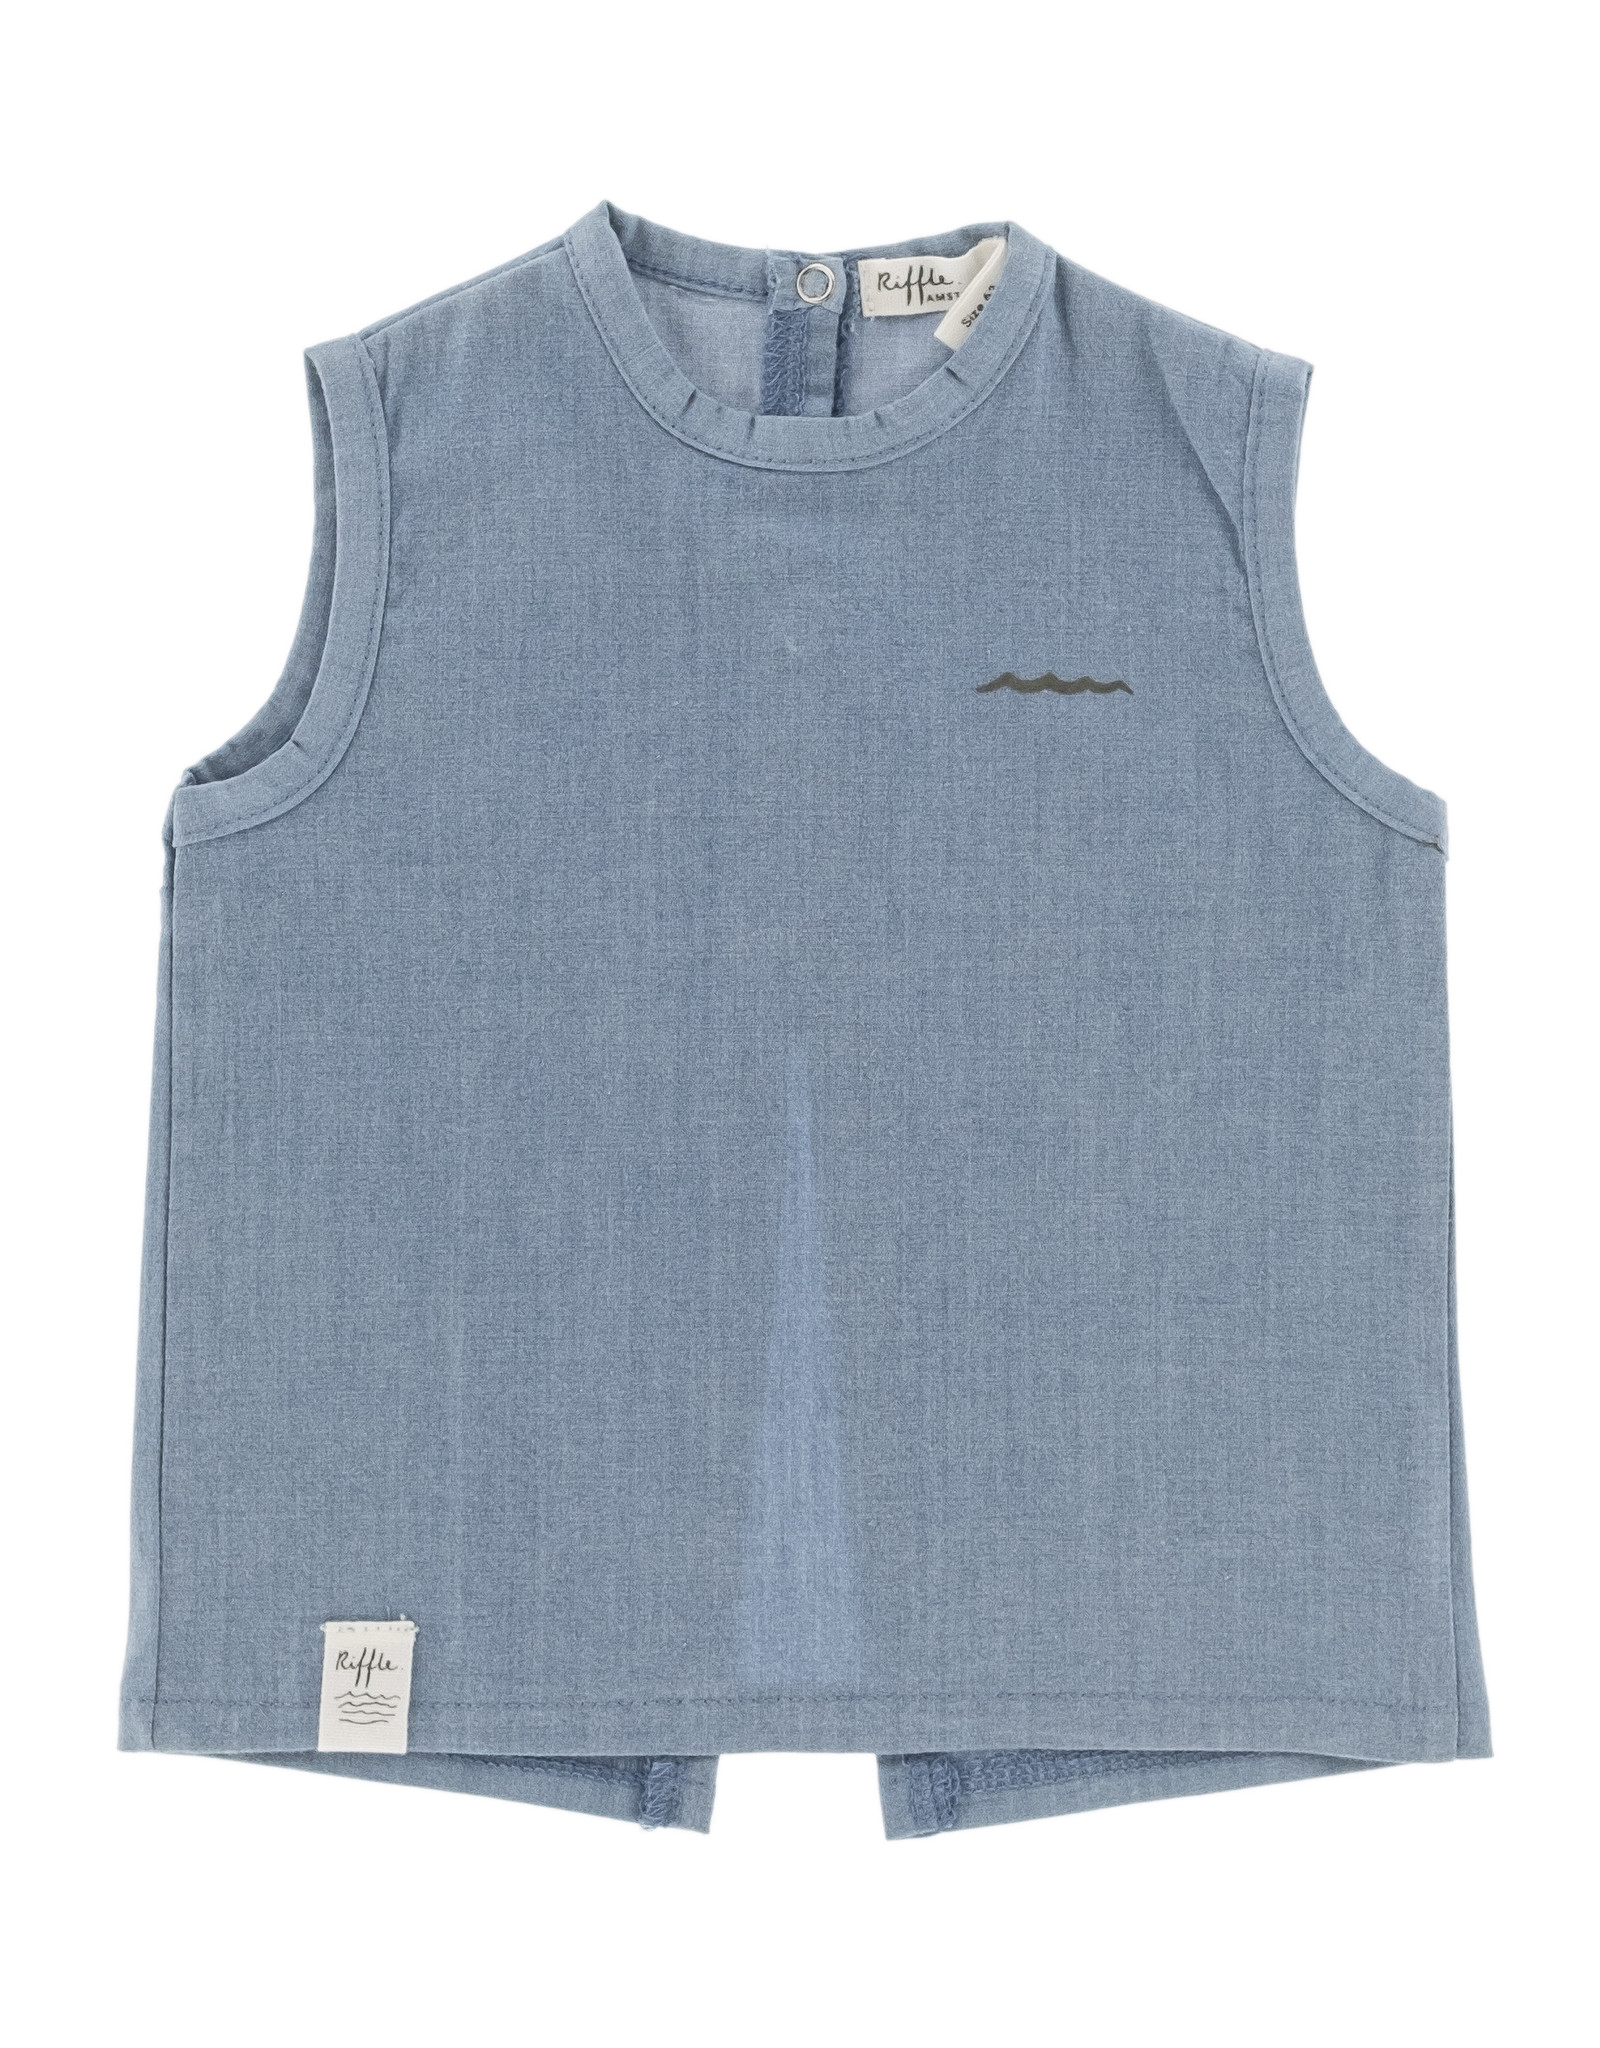 Riffle Amsterdam Riffle T-shirt short sleeve Denim